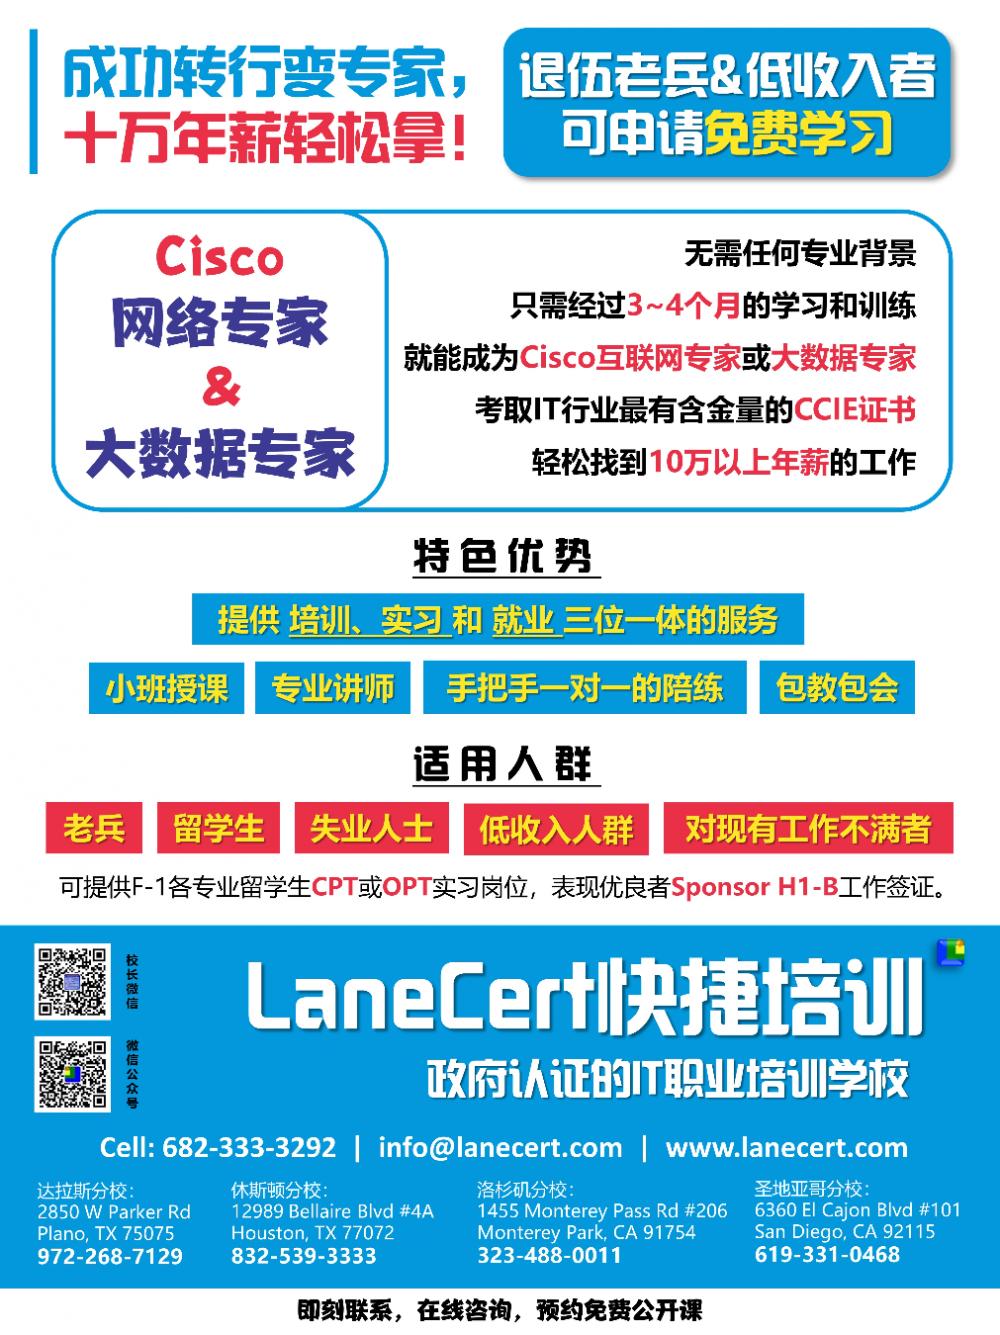 LaneCert Cisco思科網路教學中心